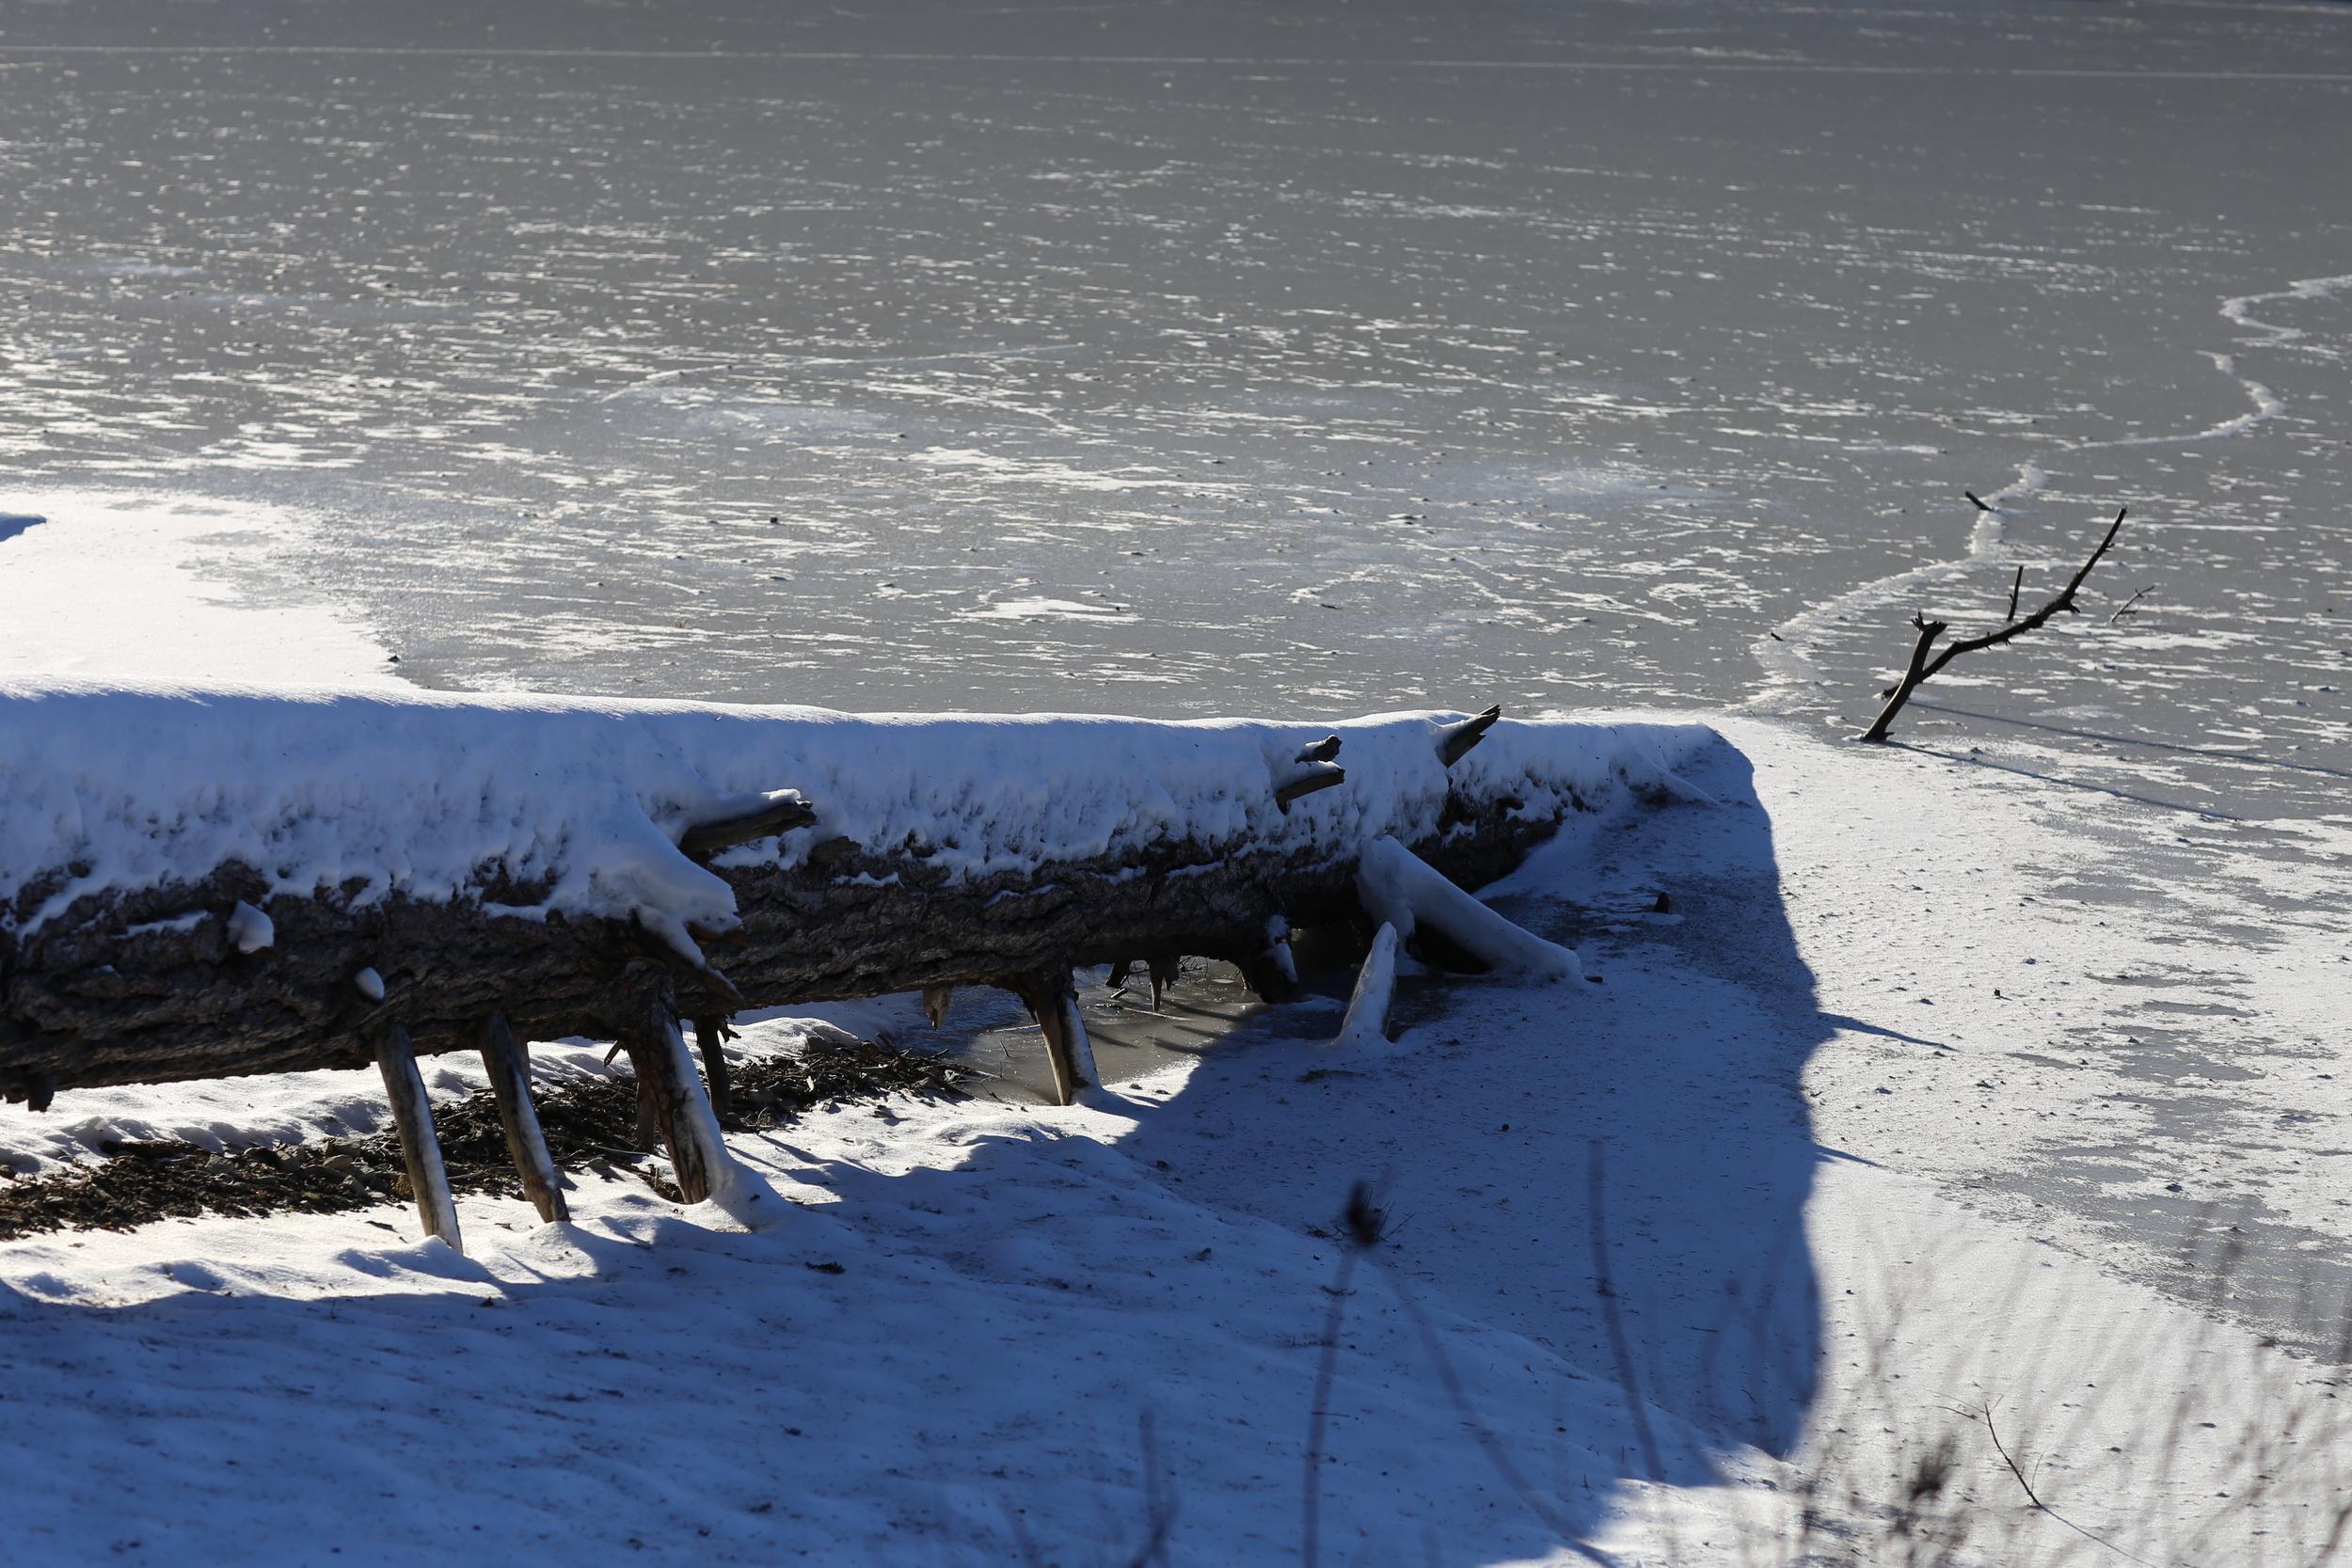 Fallen tree on the beach